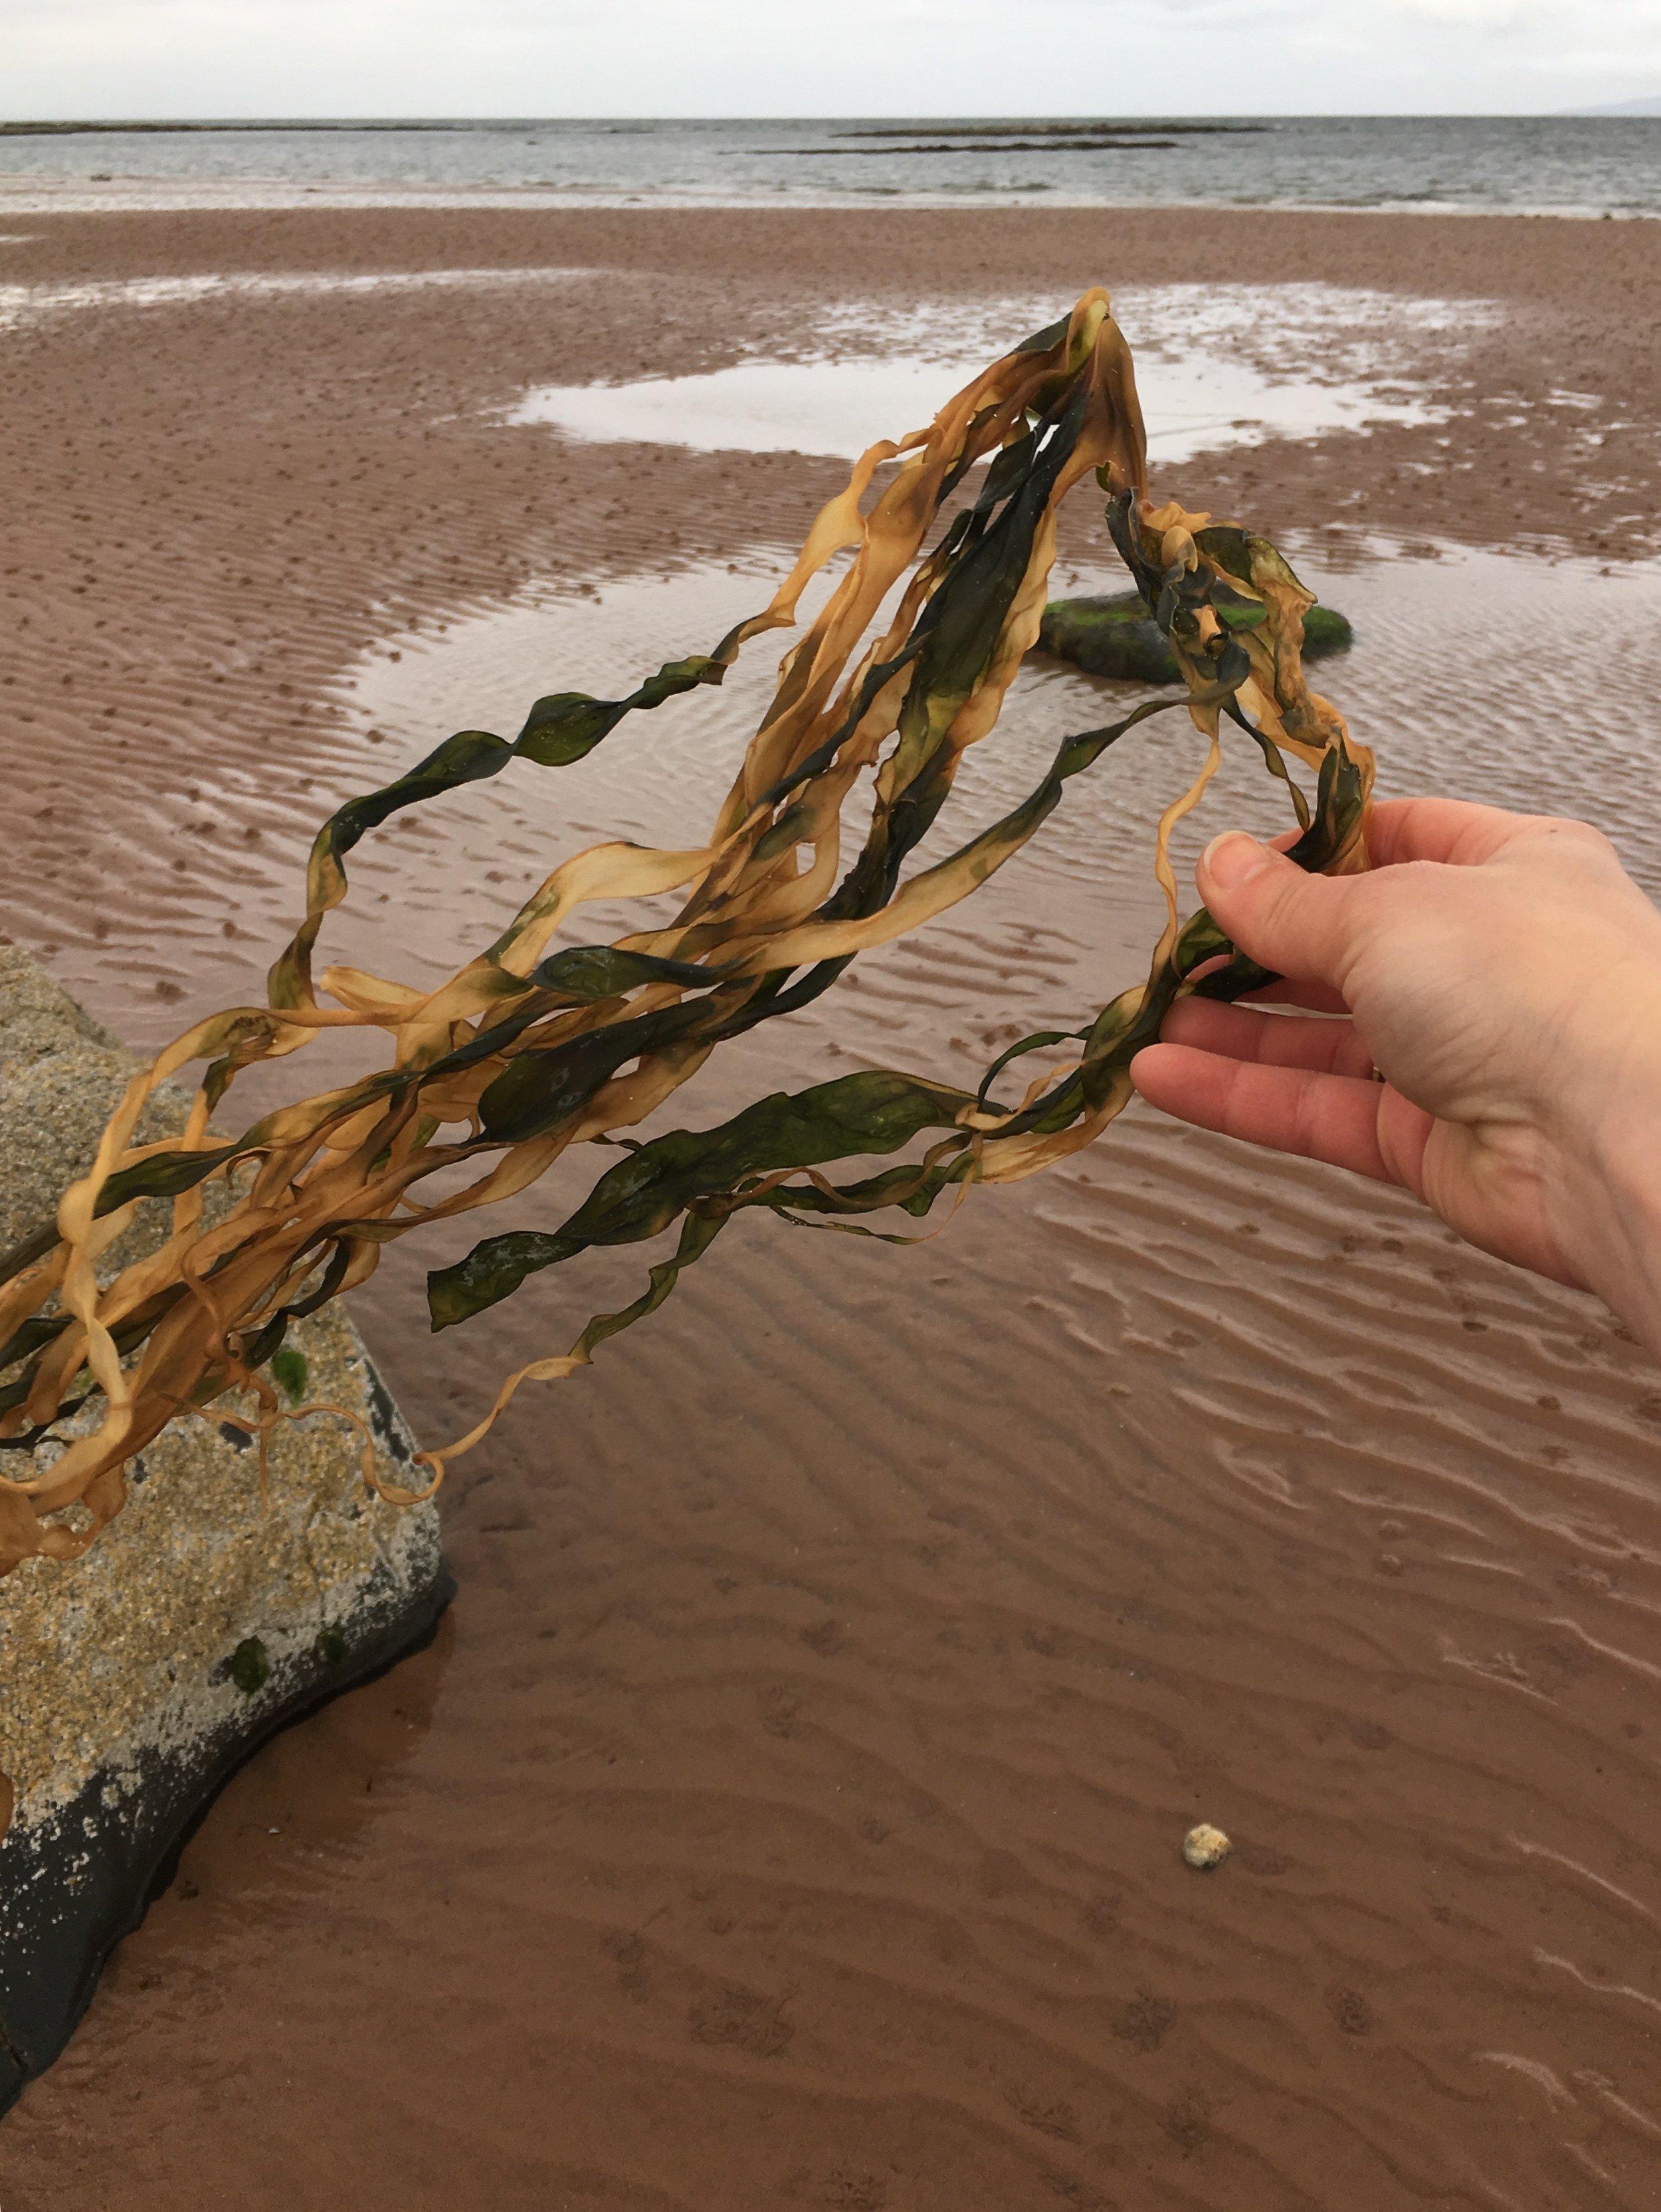 Returning some seaweed that I borrowed